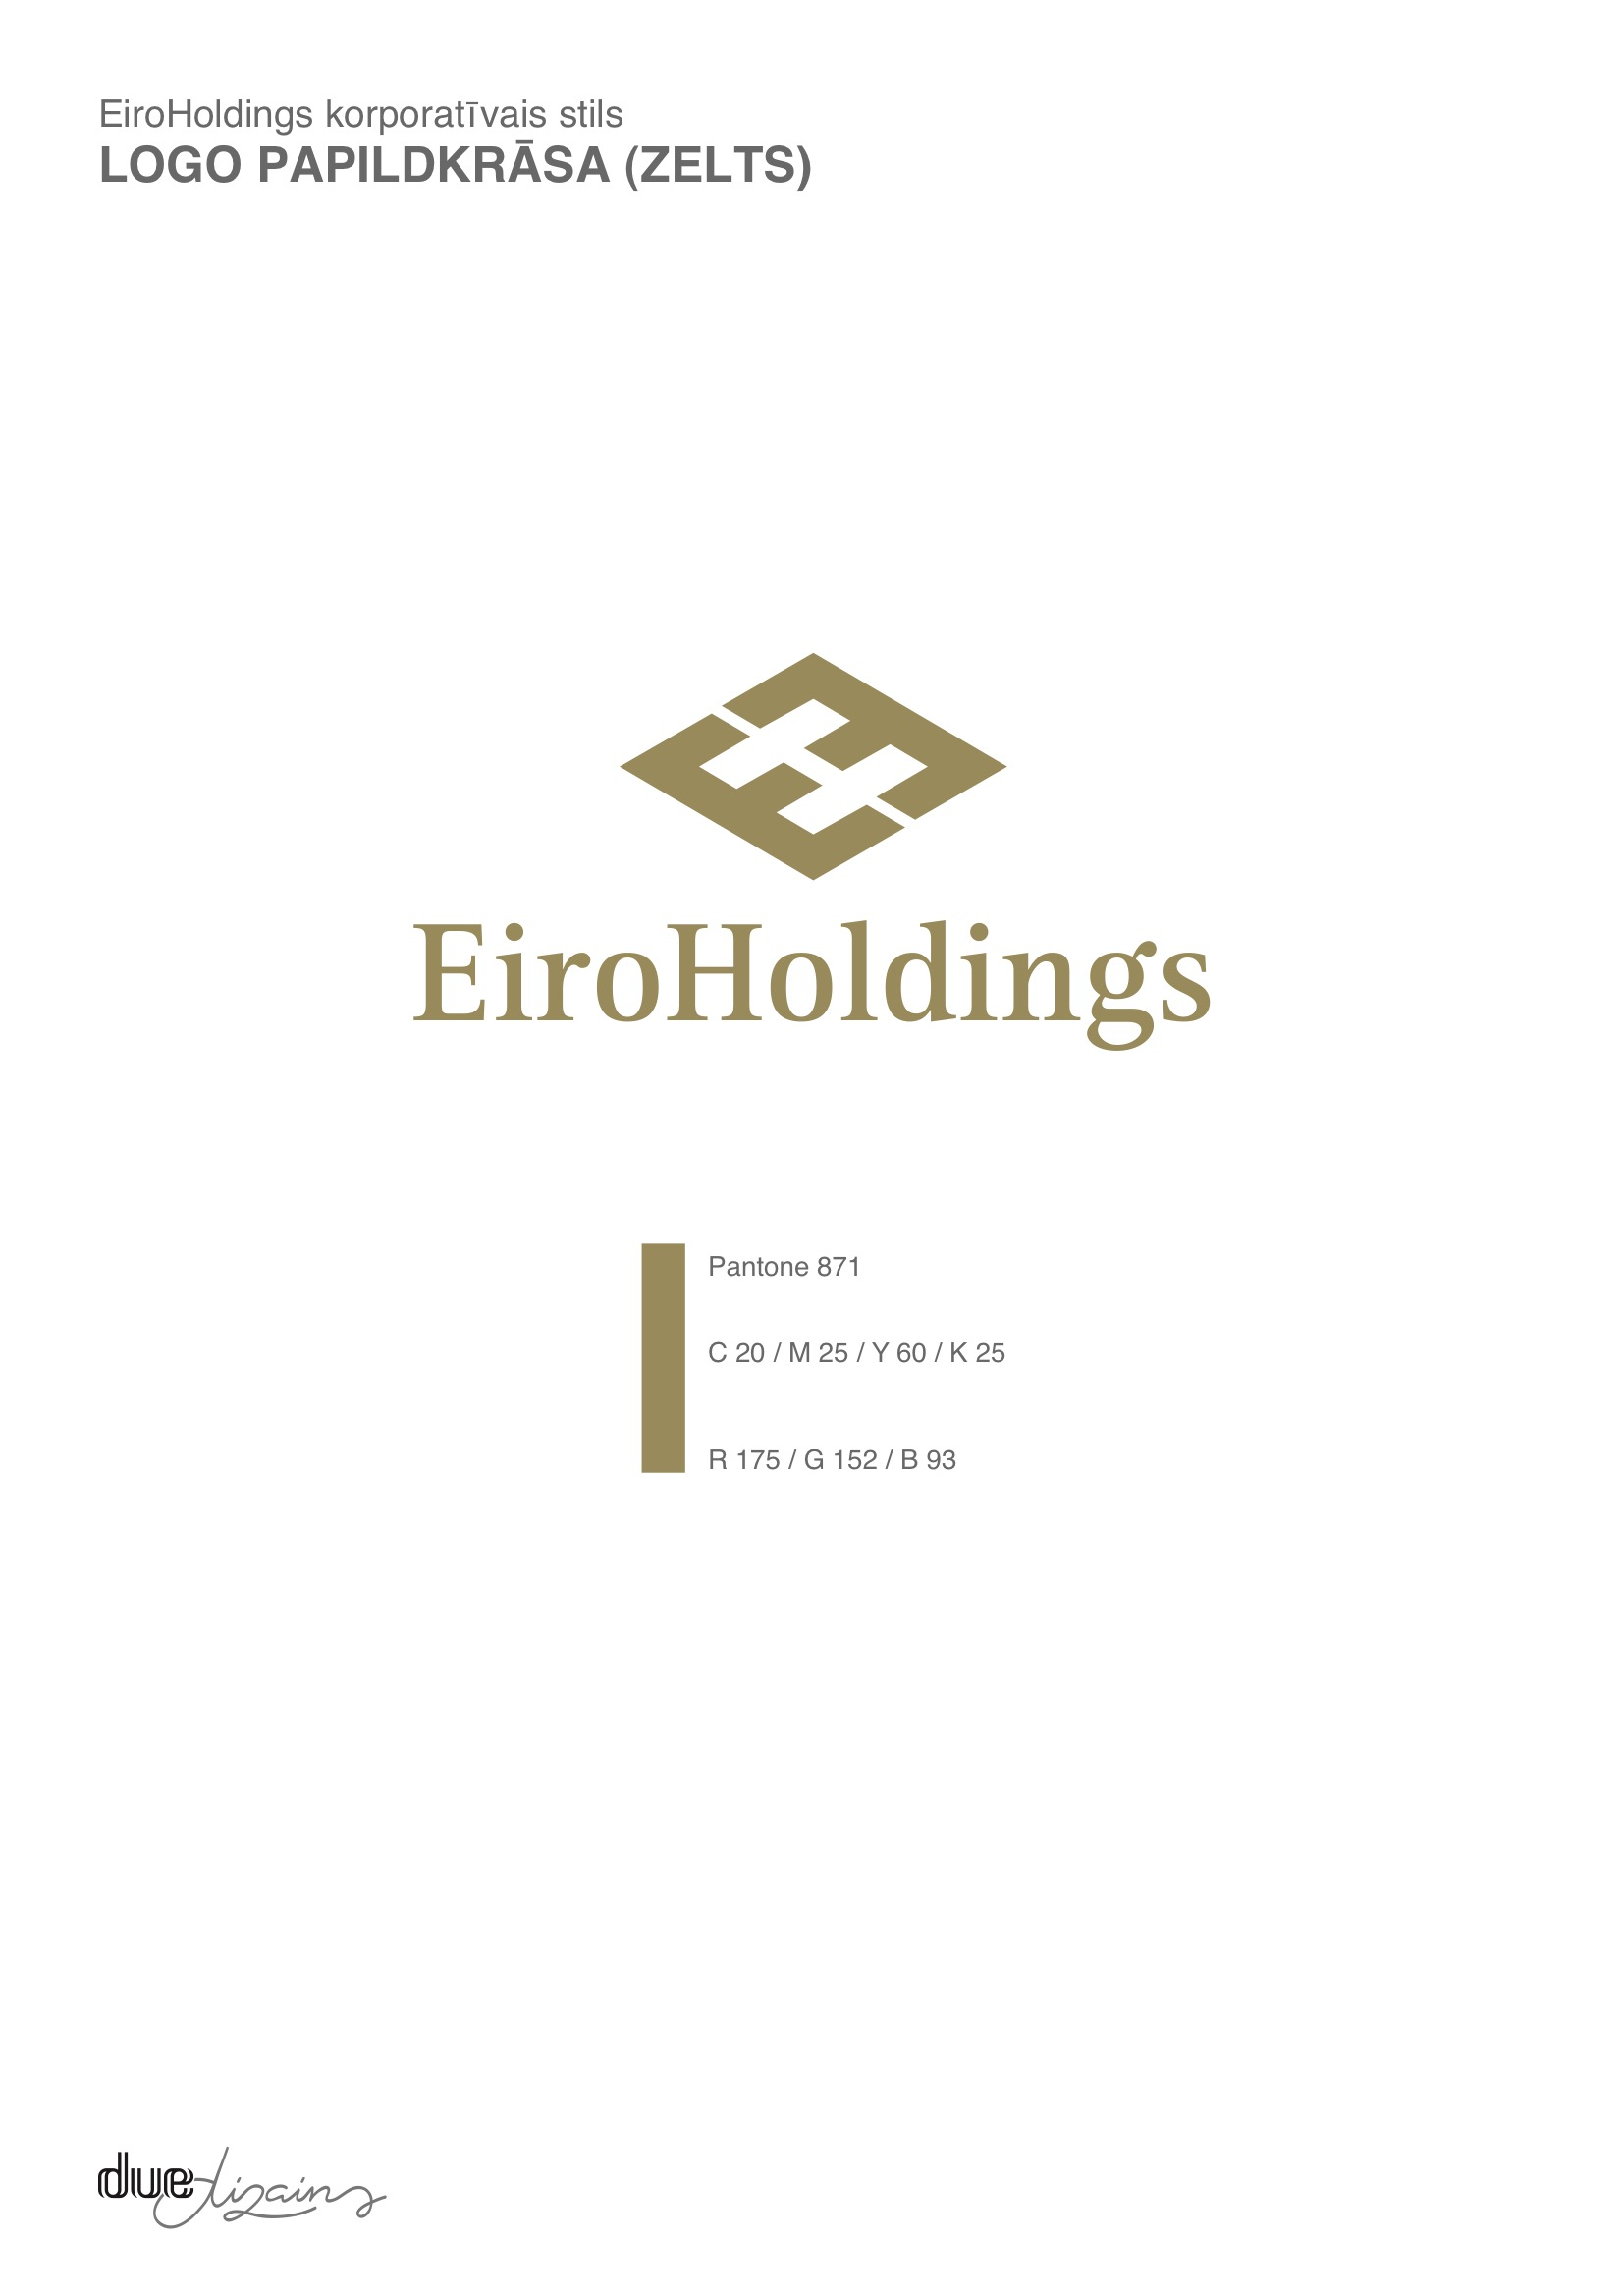 Eiroholdings_logo_guidelines 5